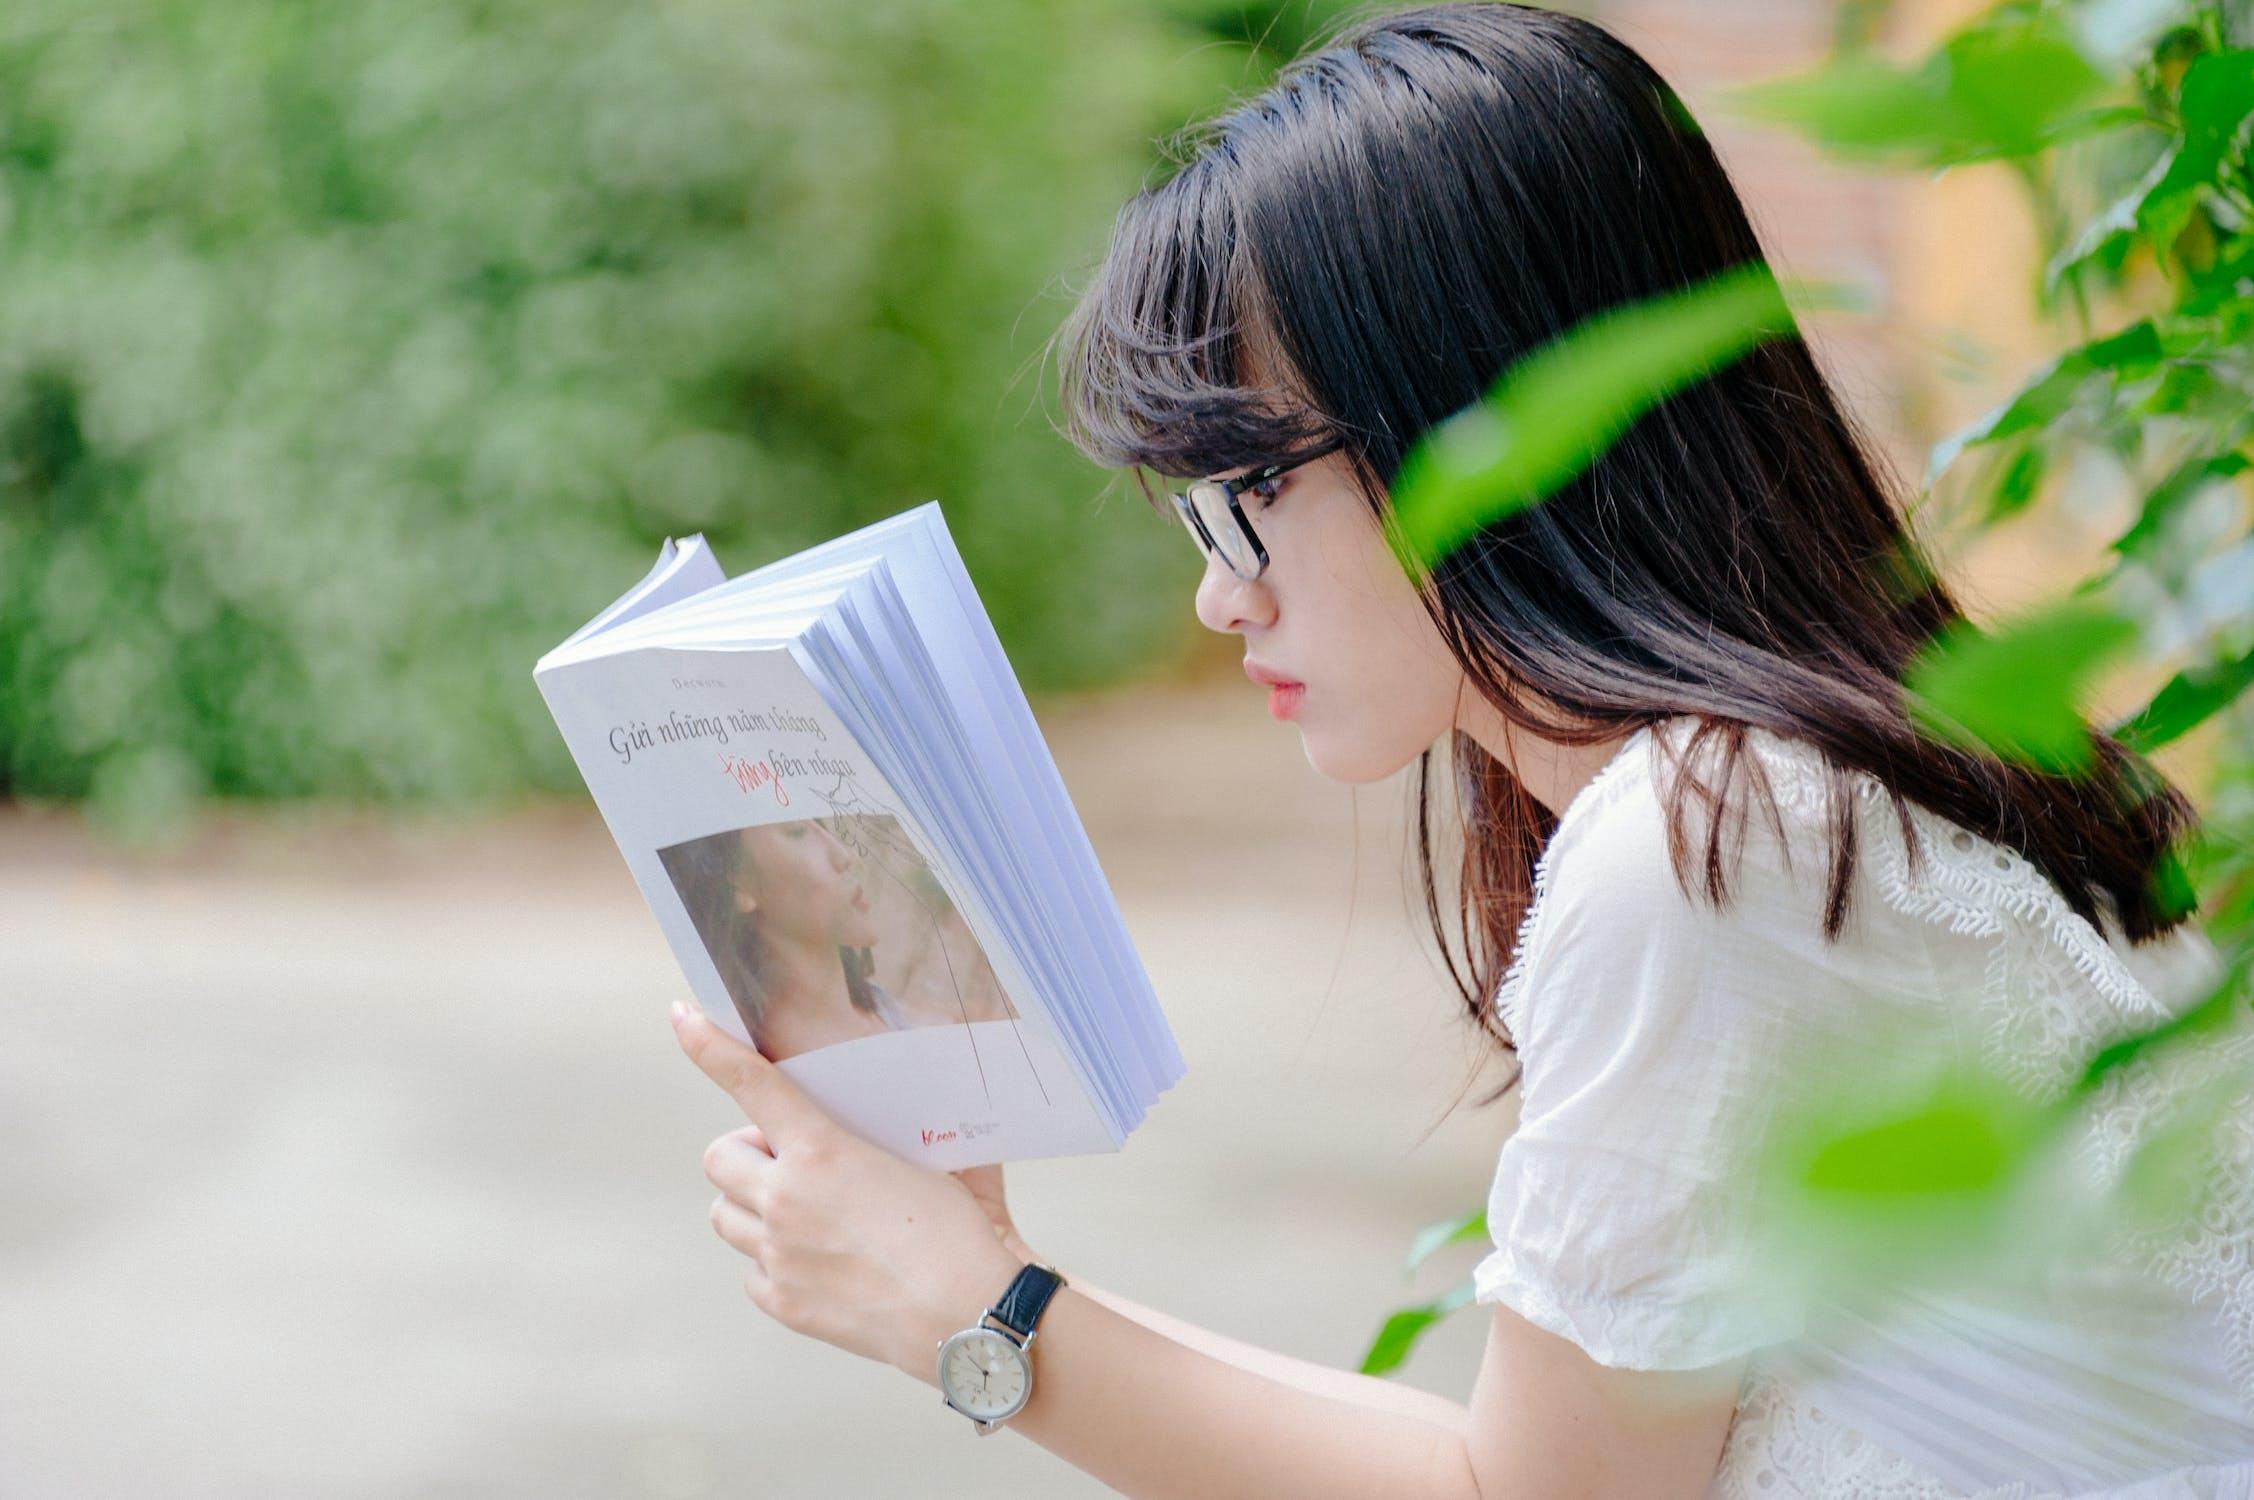 Reading Books Increase One's IQ